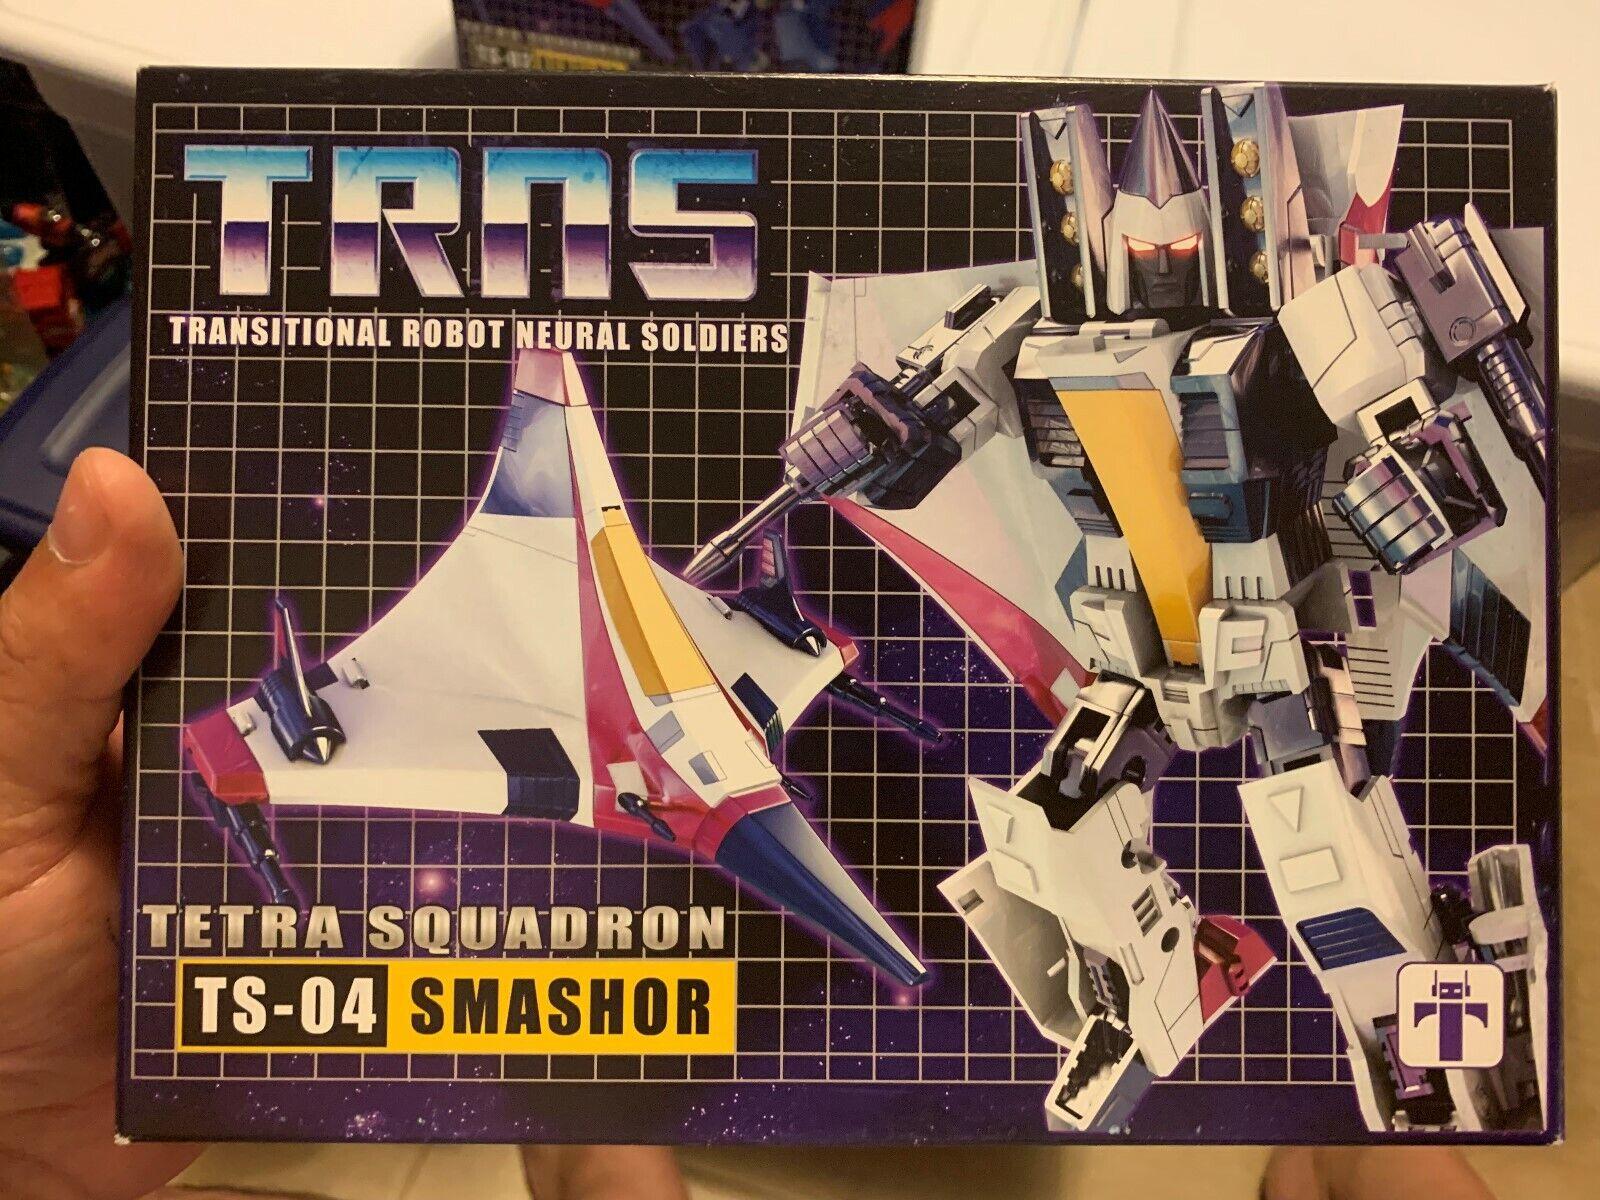 Transfomers Impossible giocattoli Tetra Squadron TS04 Smashor  Ramjet LQQK MINTY